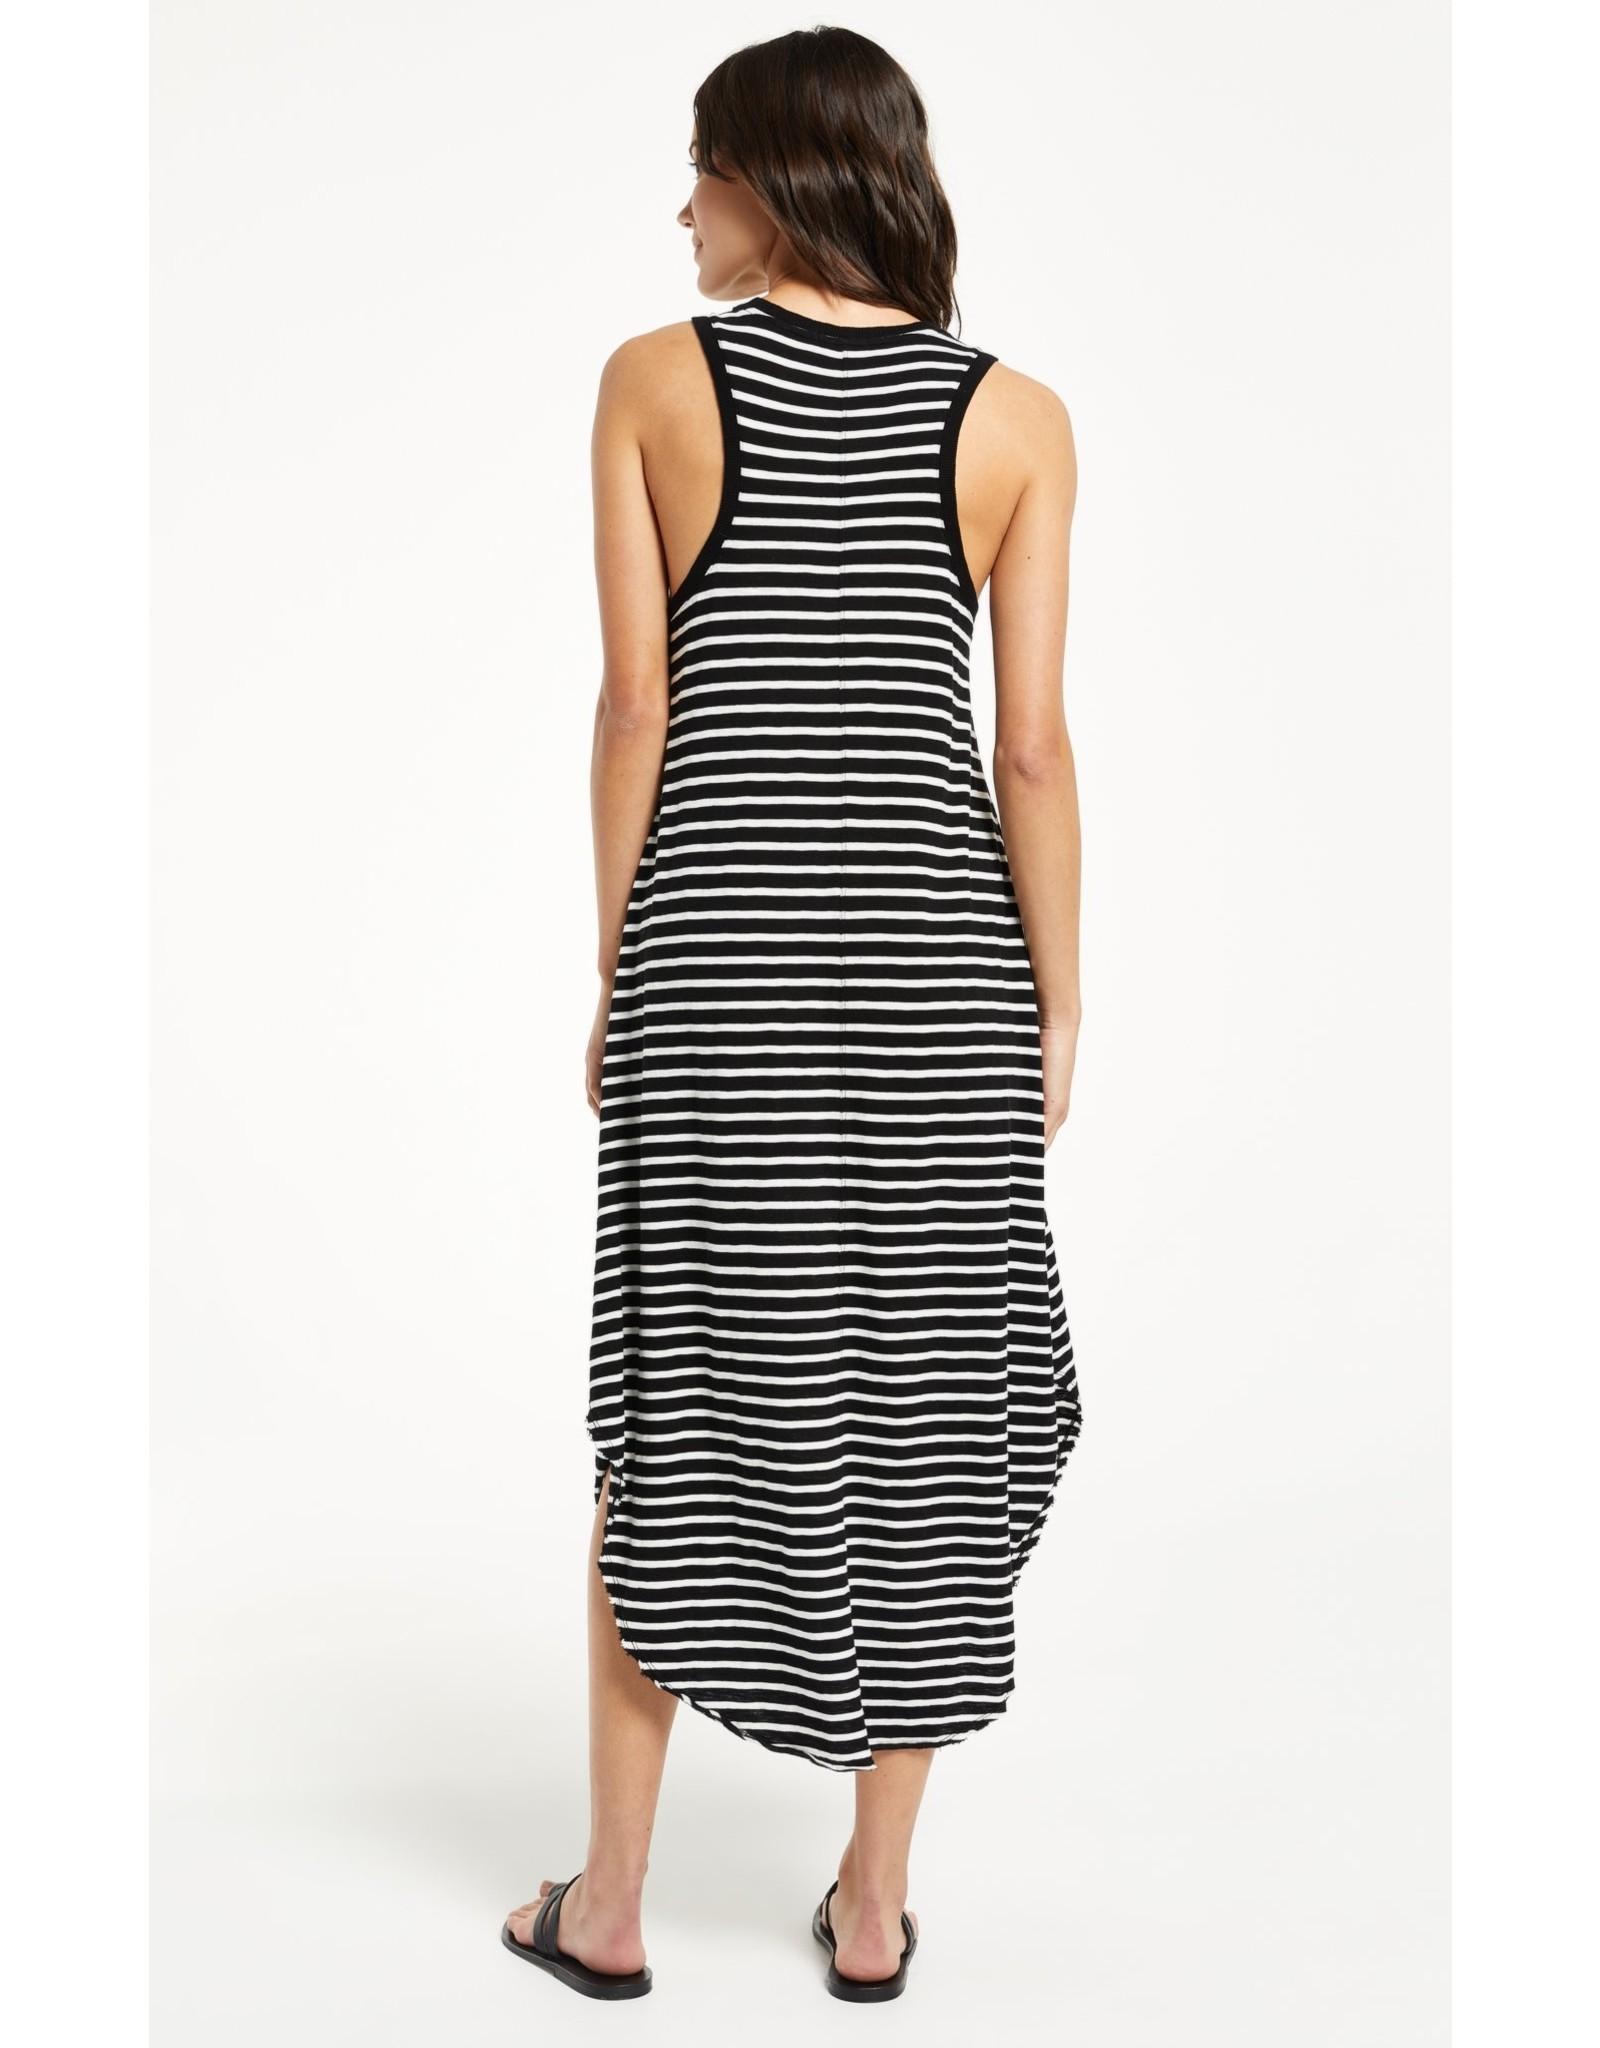 Z Supply Reverie Inverted Stripe Dress